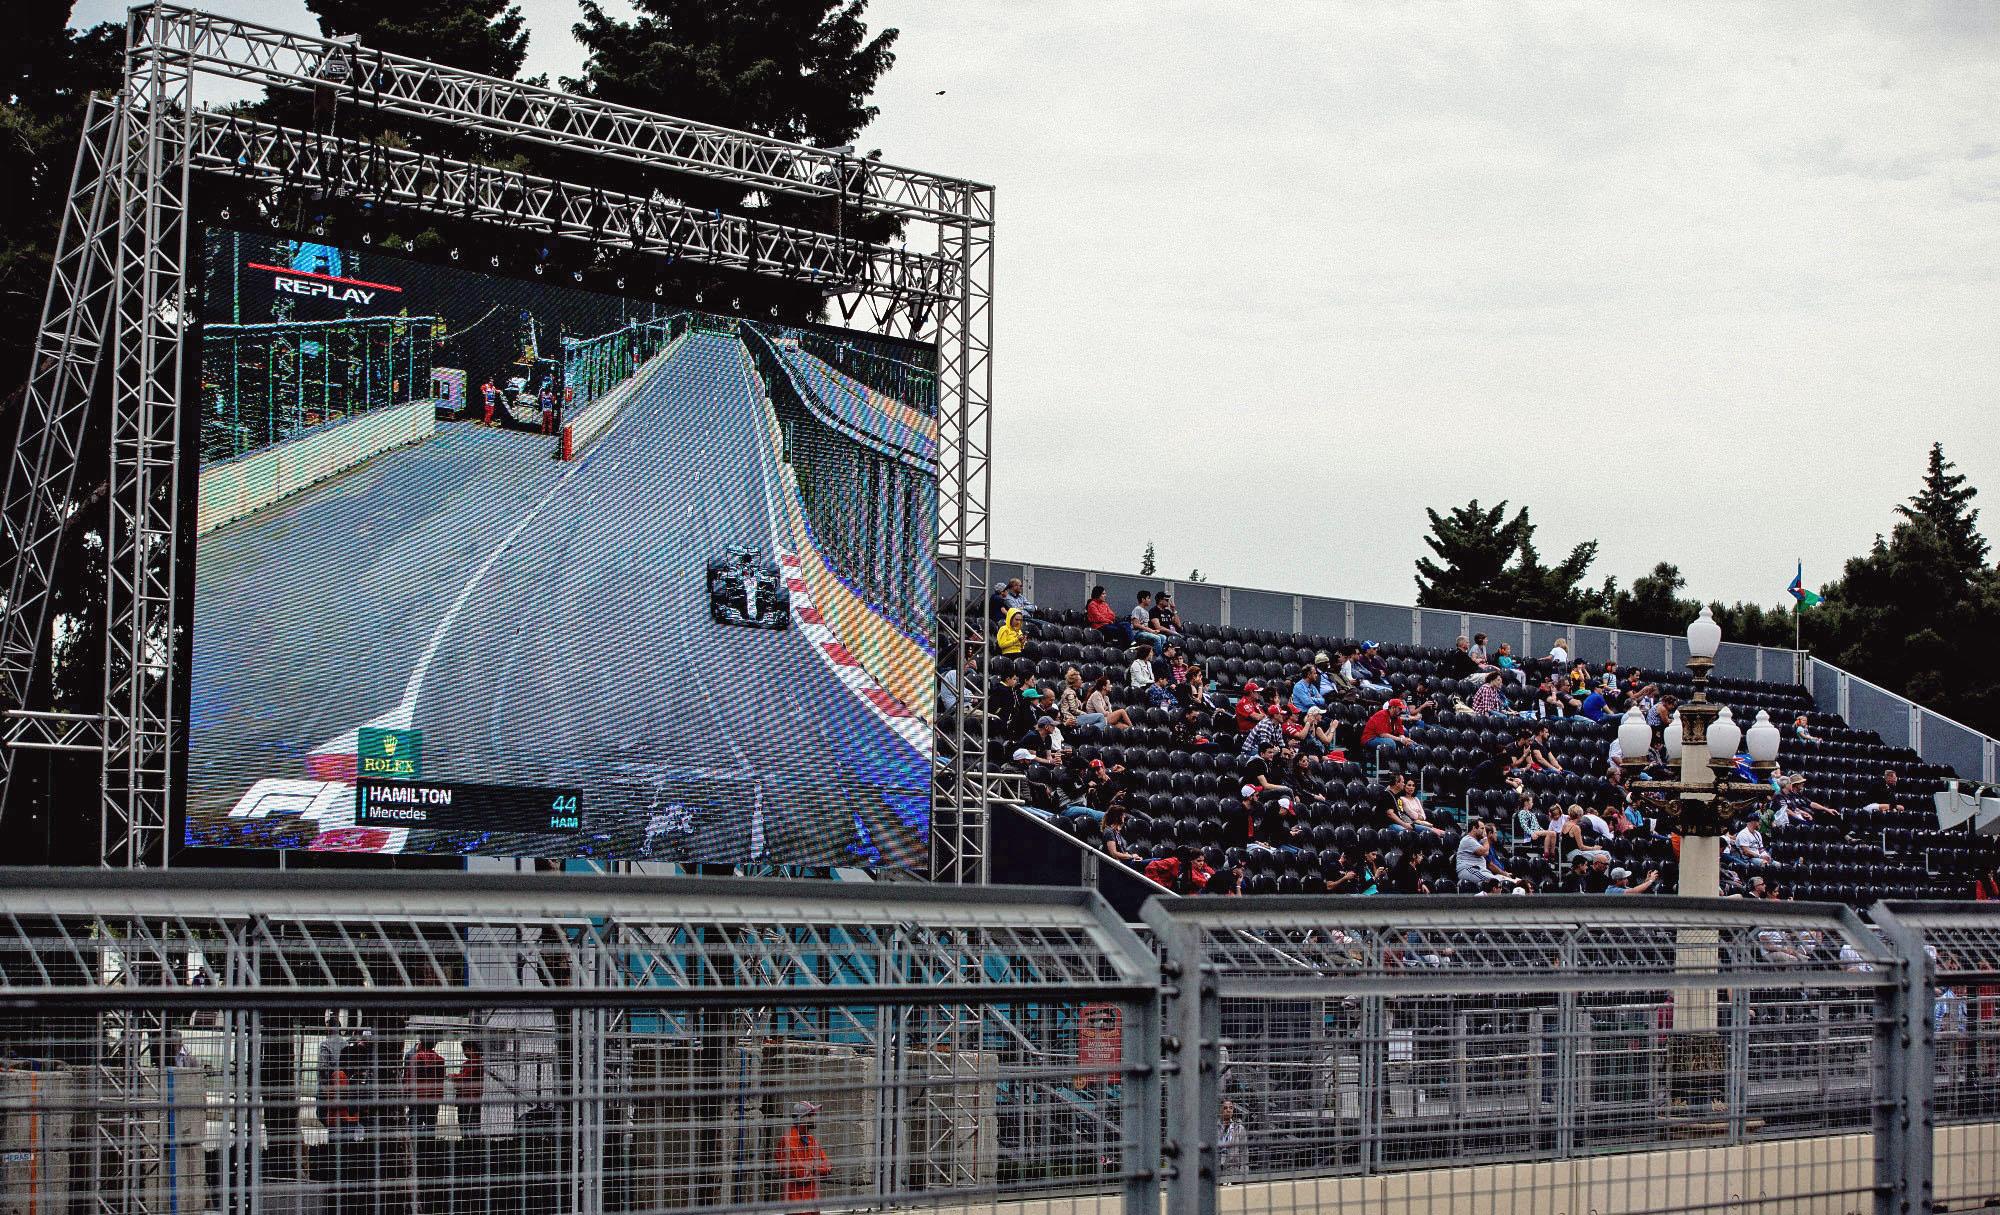 Вид на экран и трибуну «Бульвар» с трибуны «Хазар»